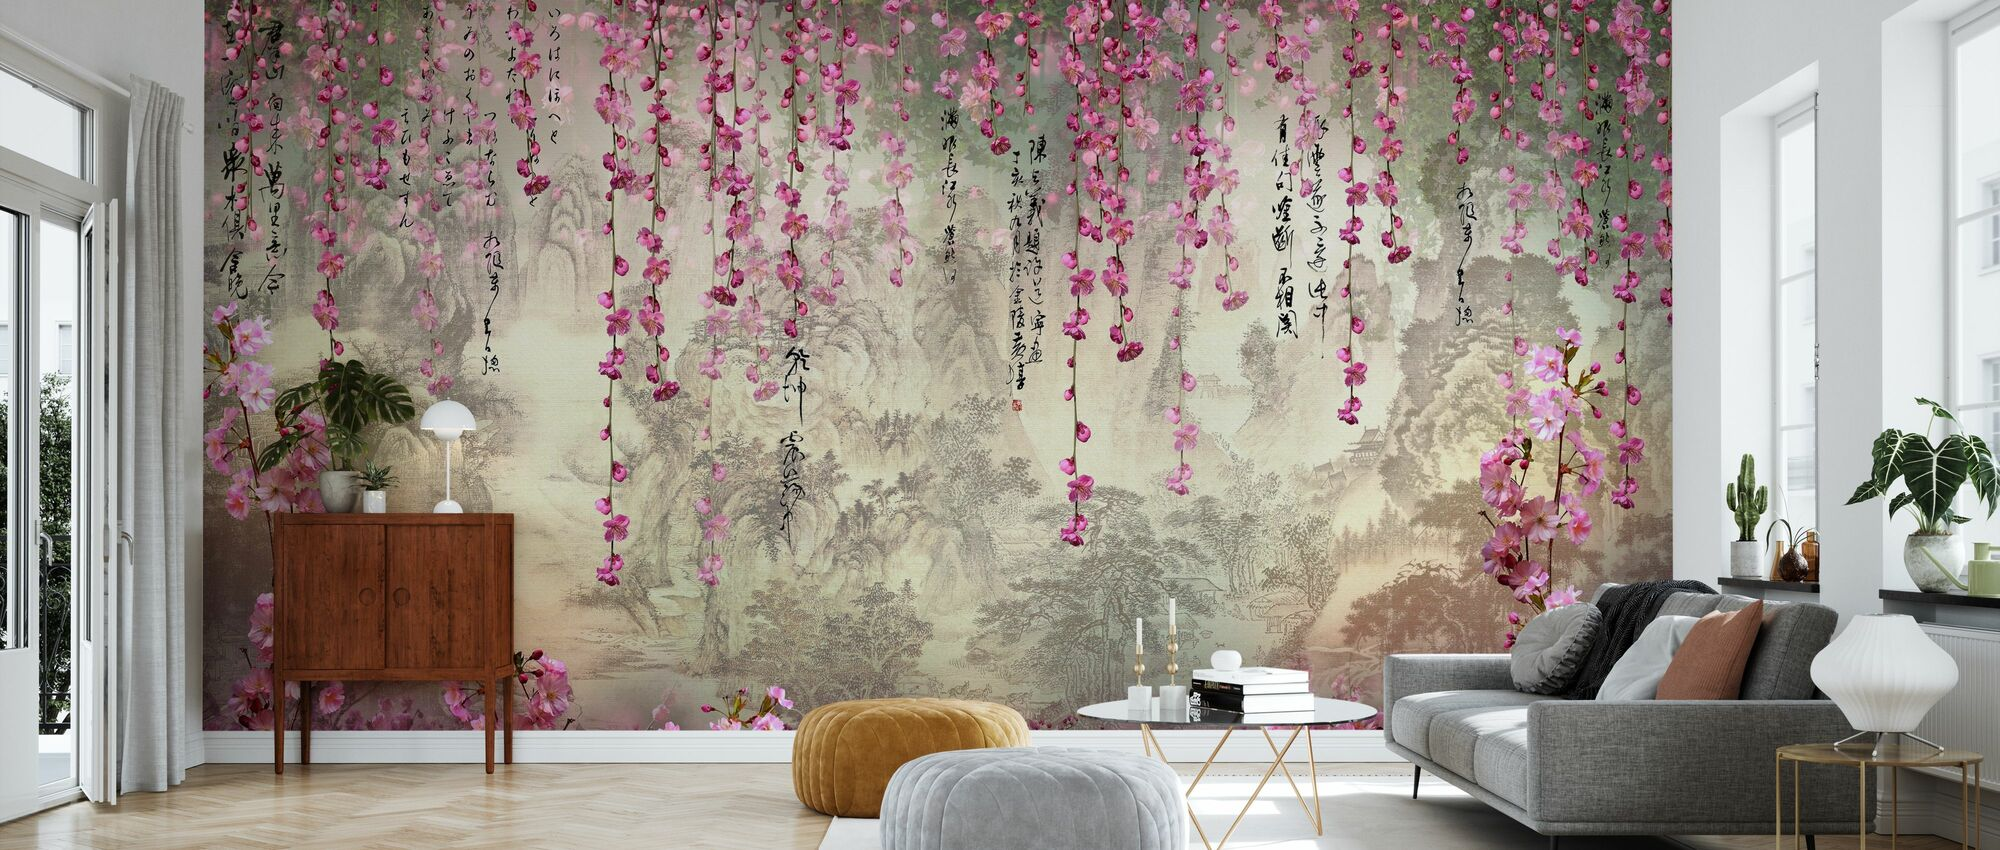 Hangning Flowers - Wallpaper - Living Room